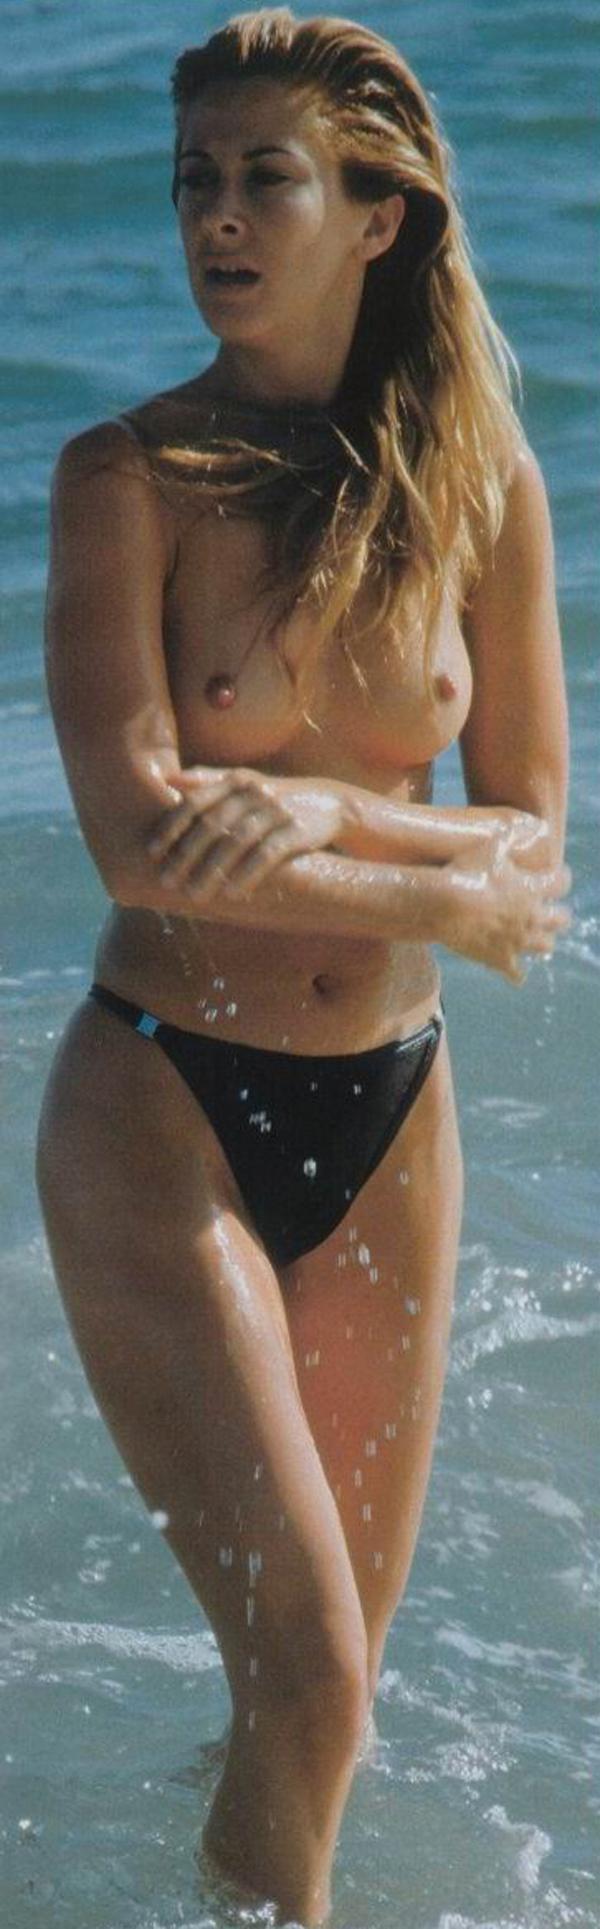 Carmen Janeiro papparazzi pillada topless desnuda